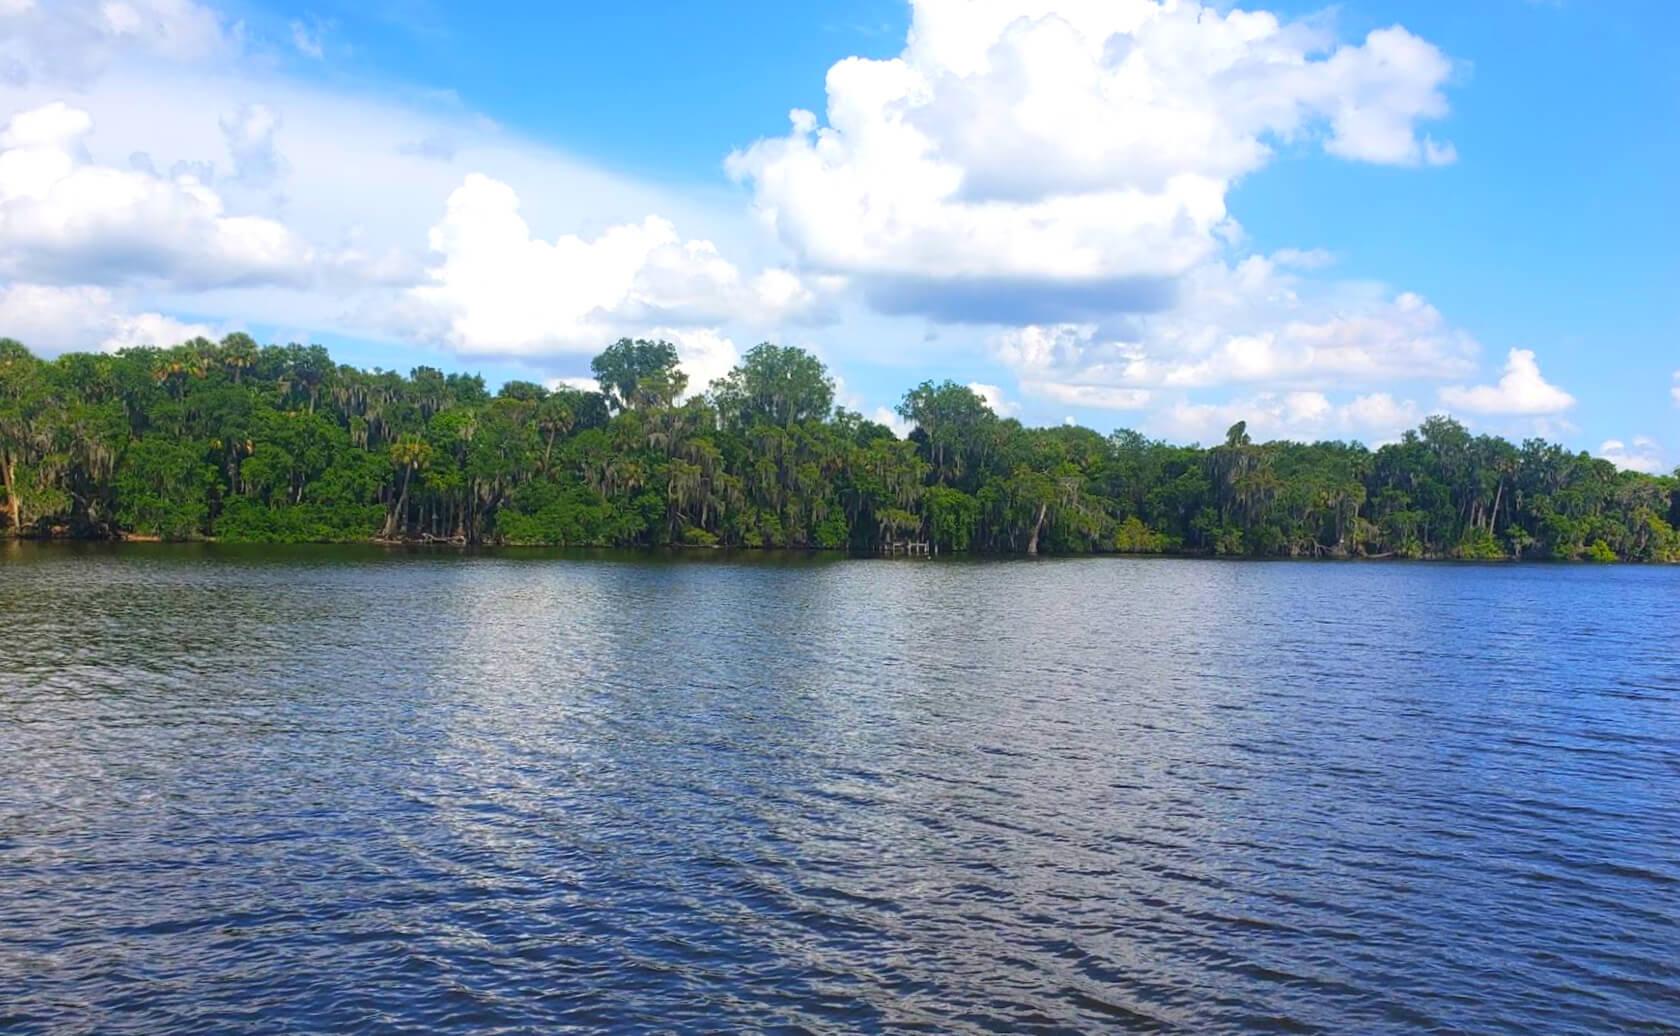 George-Lake-Fishing-Guide-Report-Florida-01